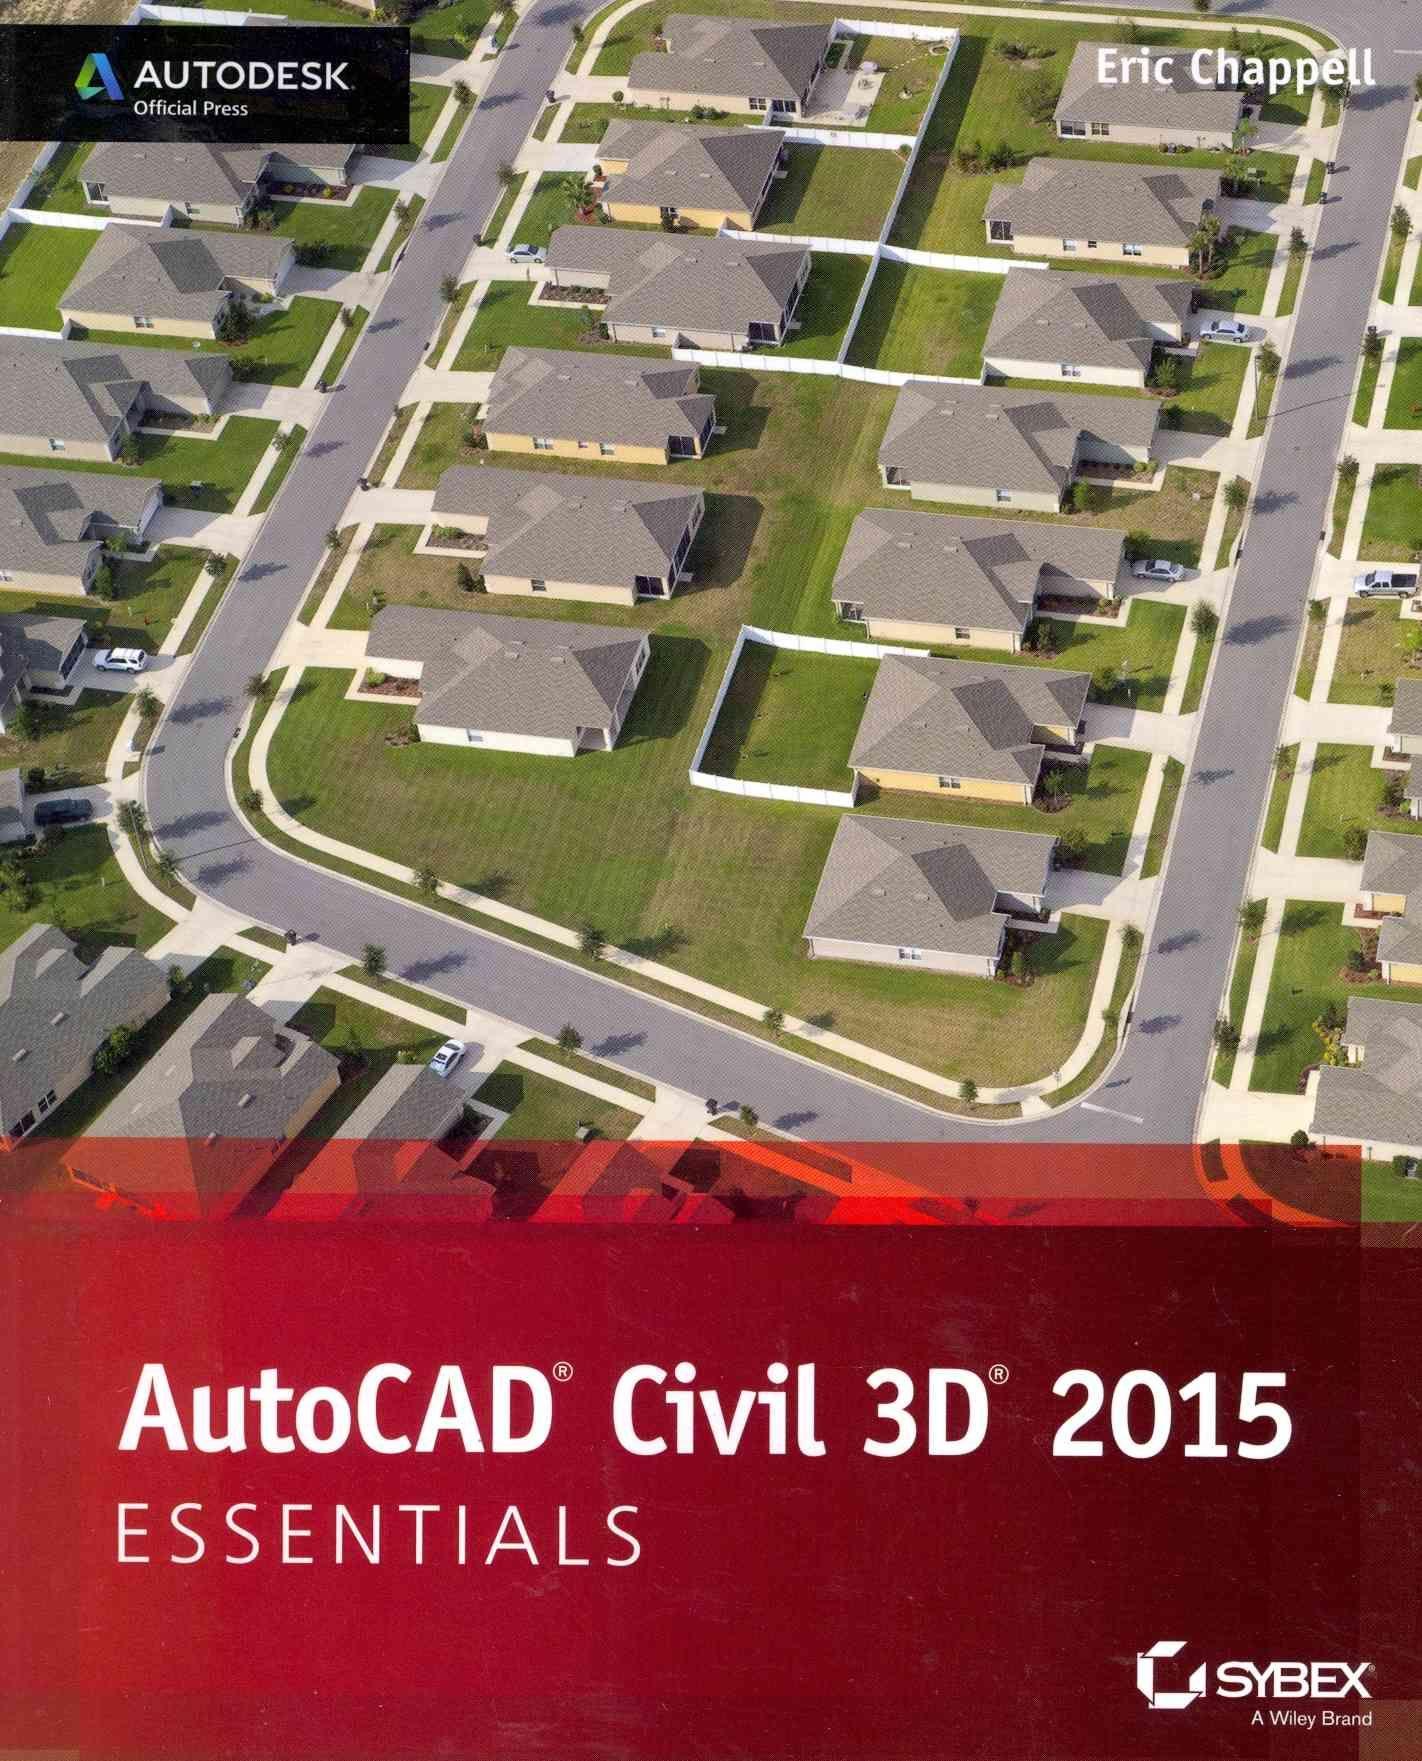 Autocad civil 3d 2015 essentials